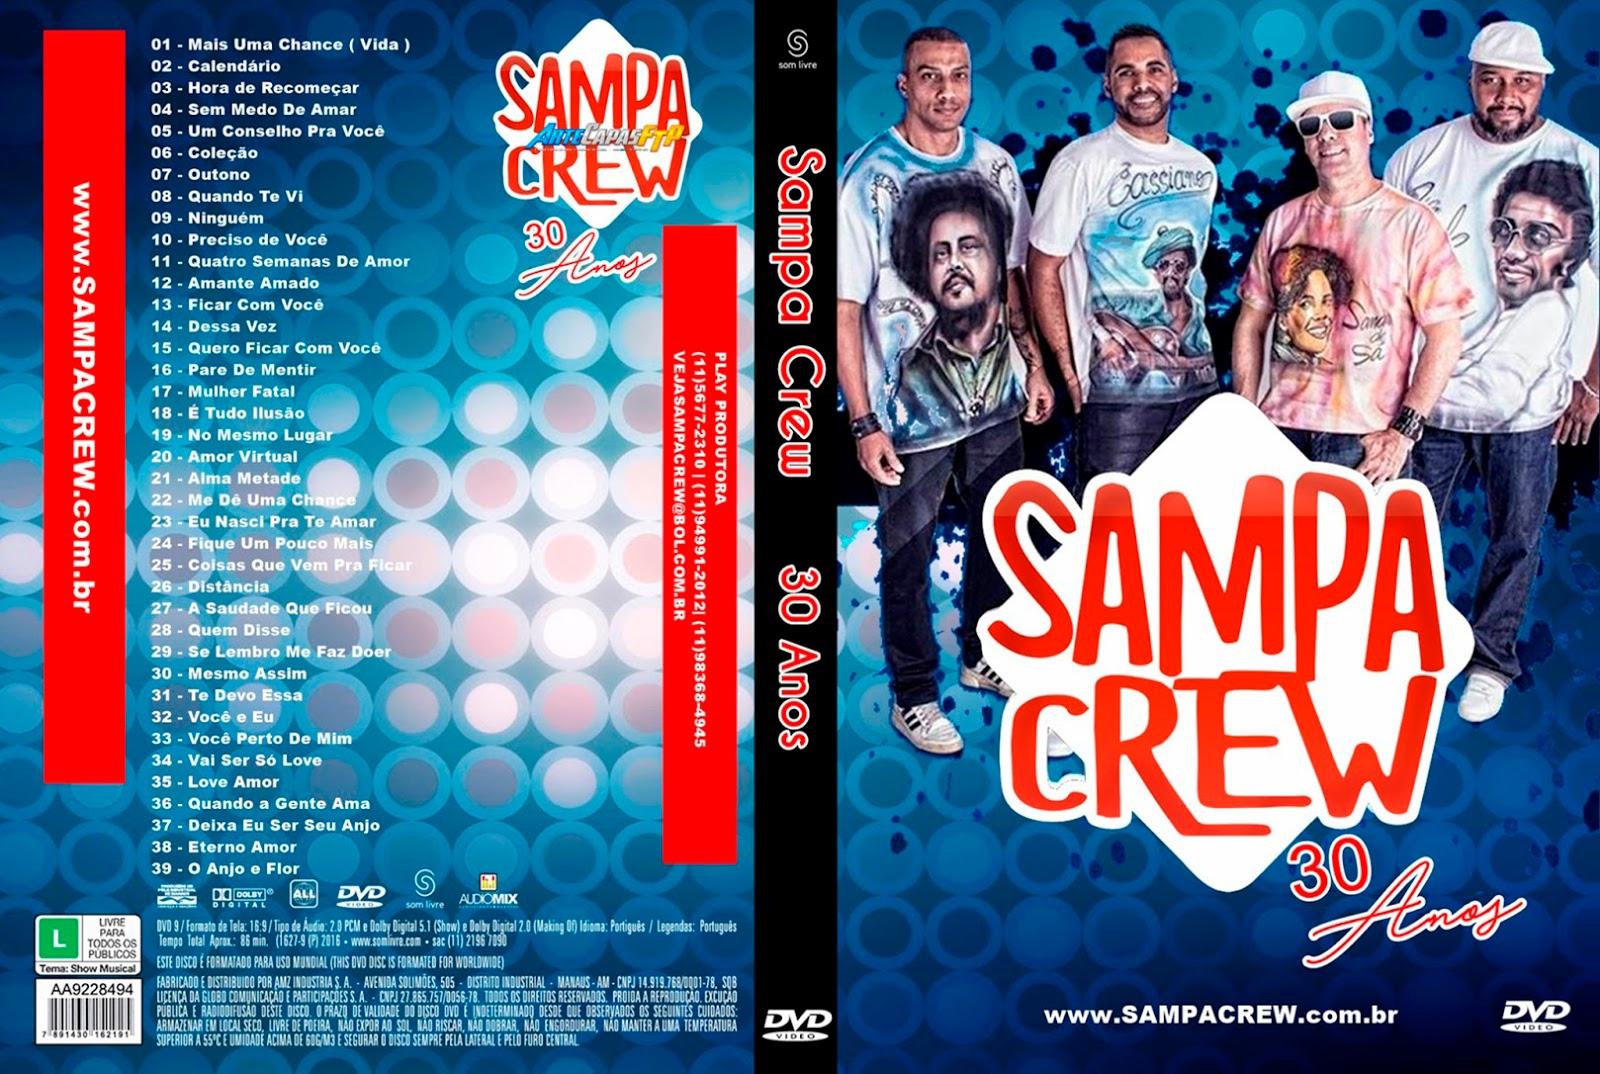 Sampa Crew 30 Anos Sampa Crew 30 Anos SAMPA 2BCREW 2B30 2BANOS 2BAO 2BVIVO 2B 2528CAPA 2529 2BXANDAODOWNLOAD